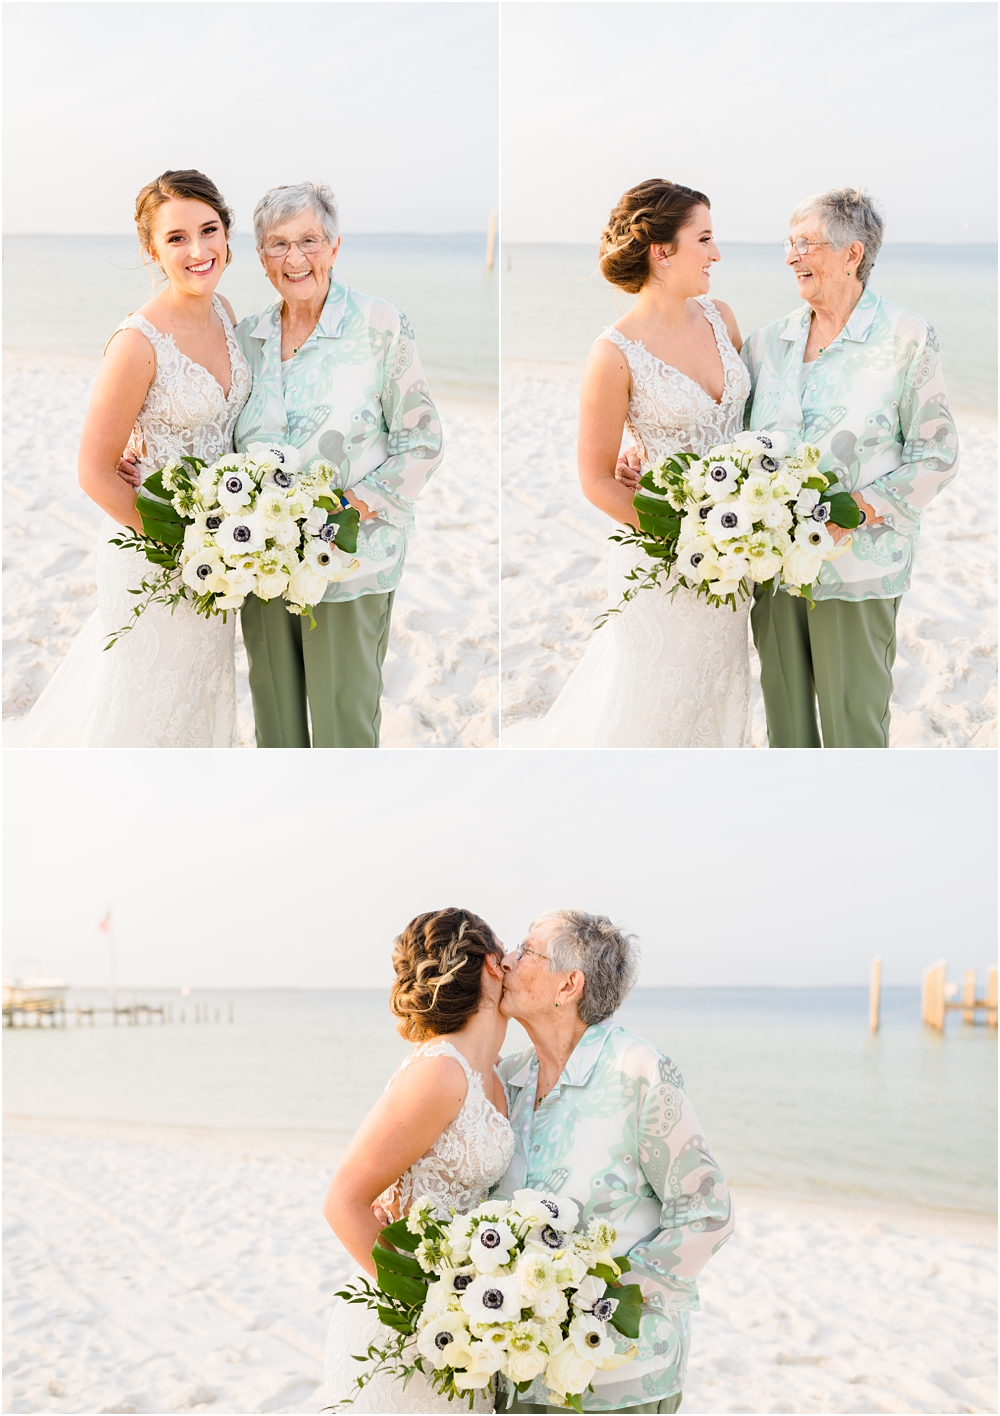 hemingways-pensacola-beach-wedding-kiersten-stevenson-photography-69.jpg